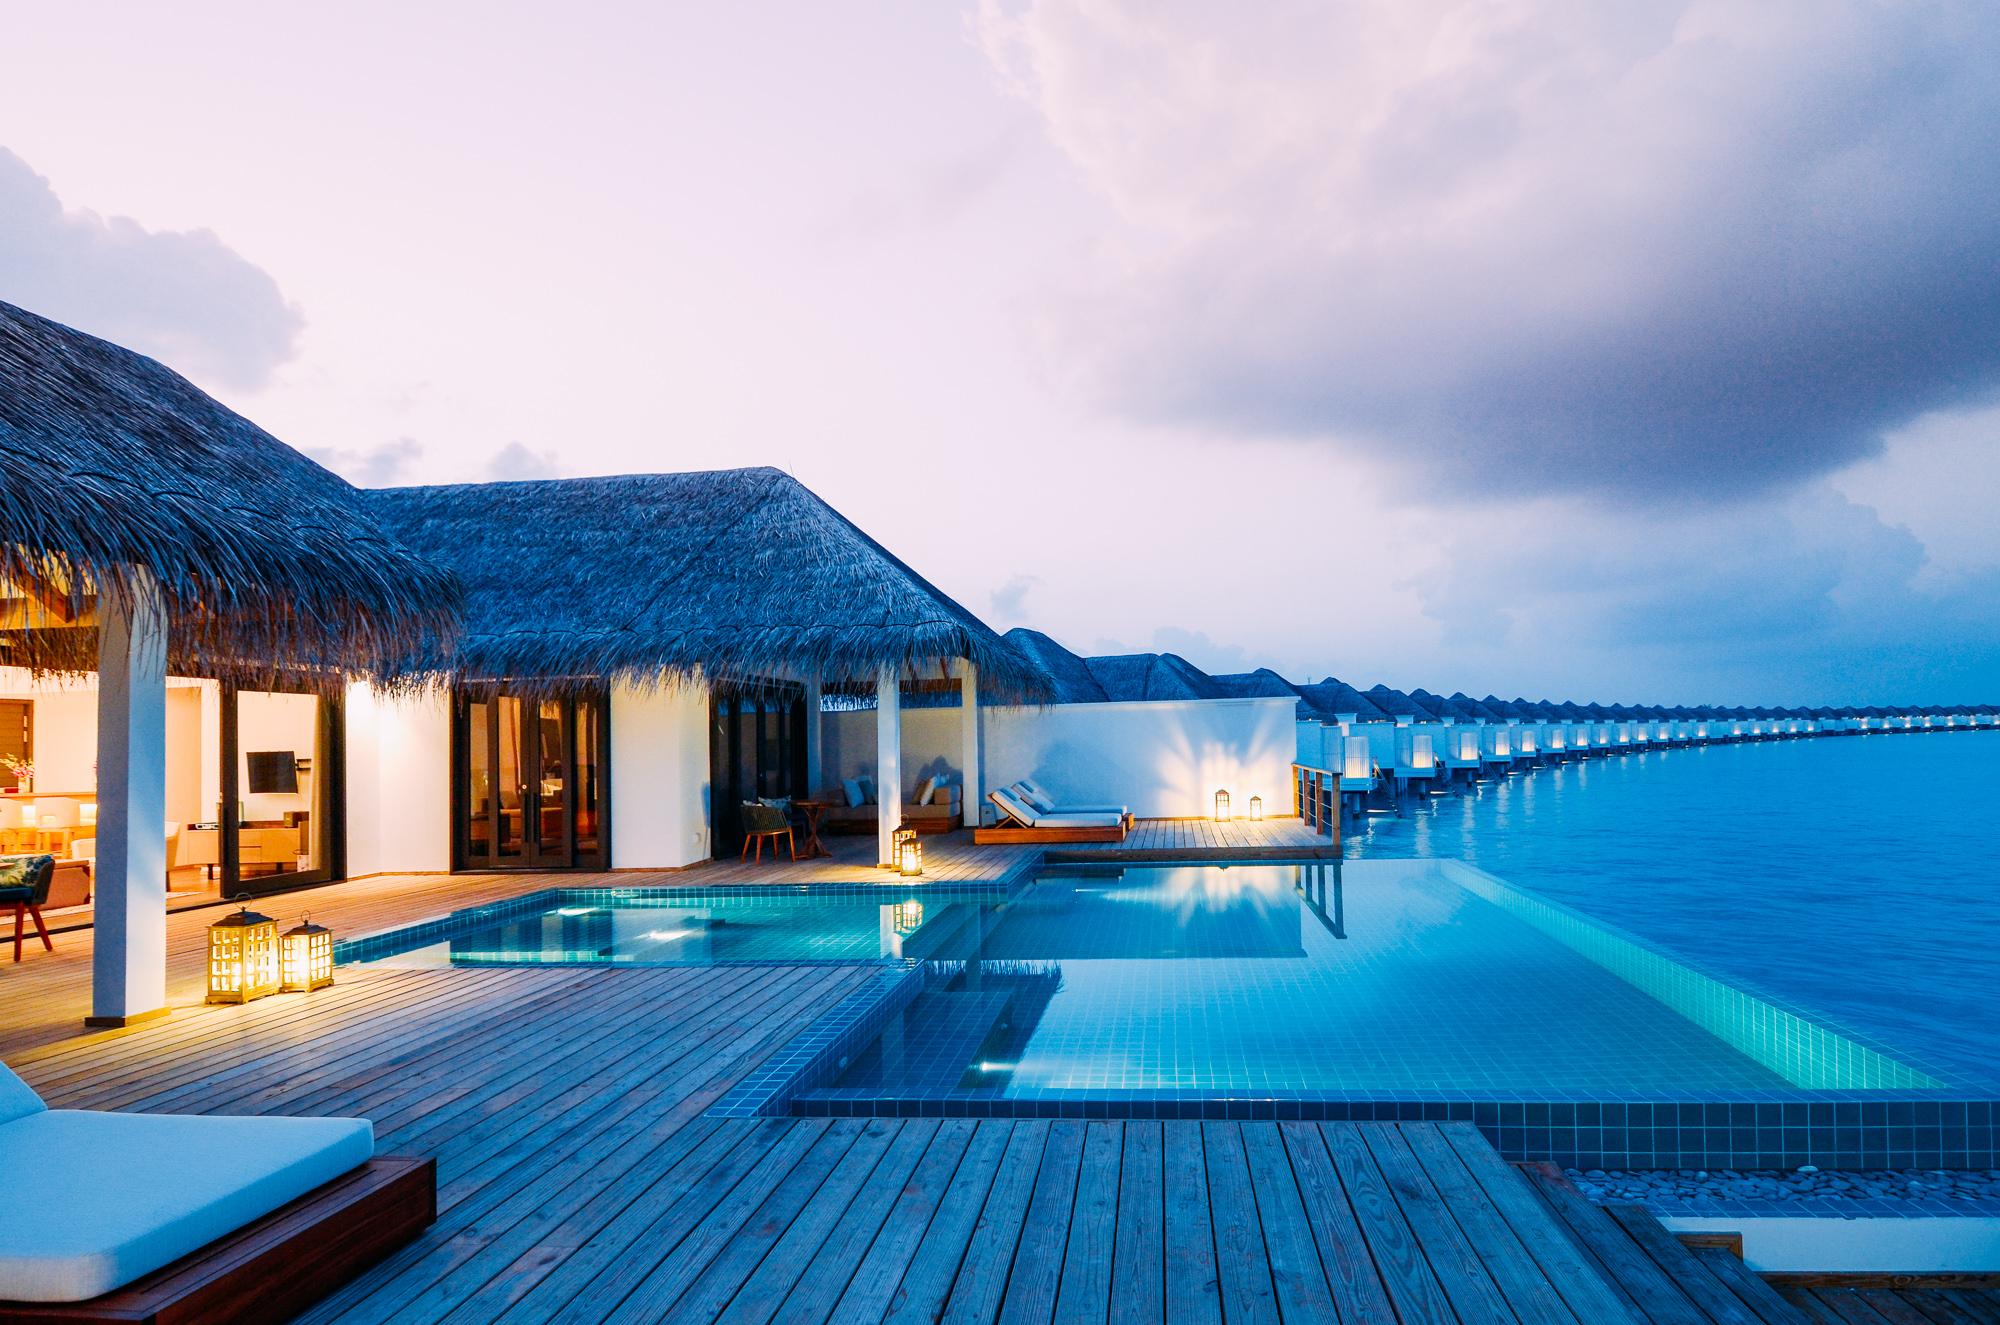 MALDIVES-21.jpg